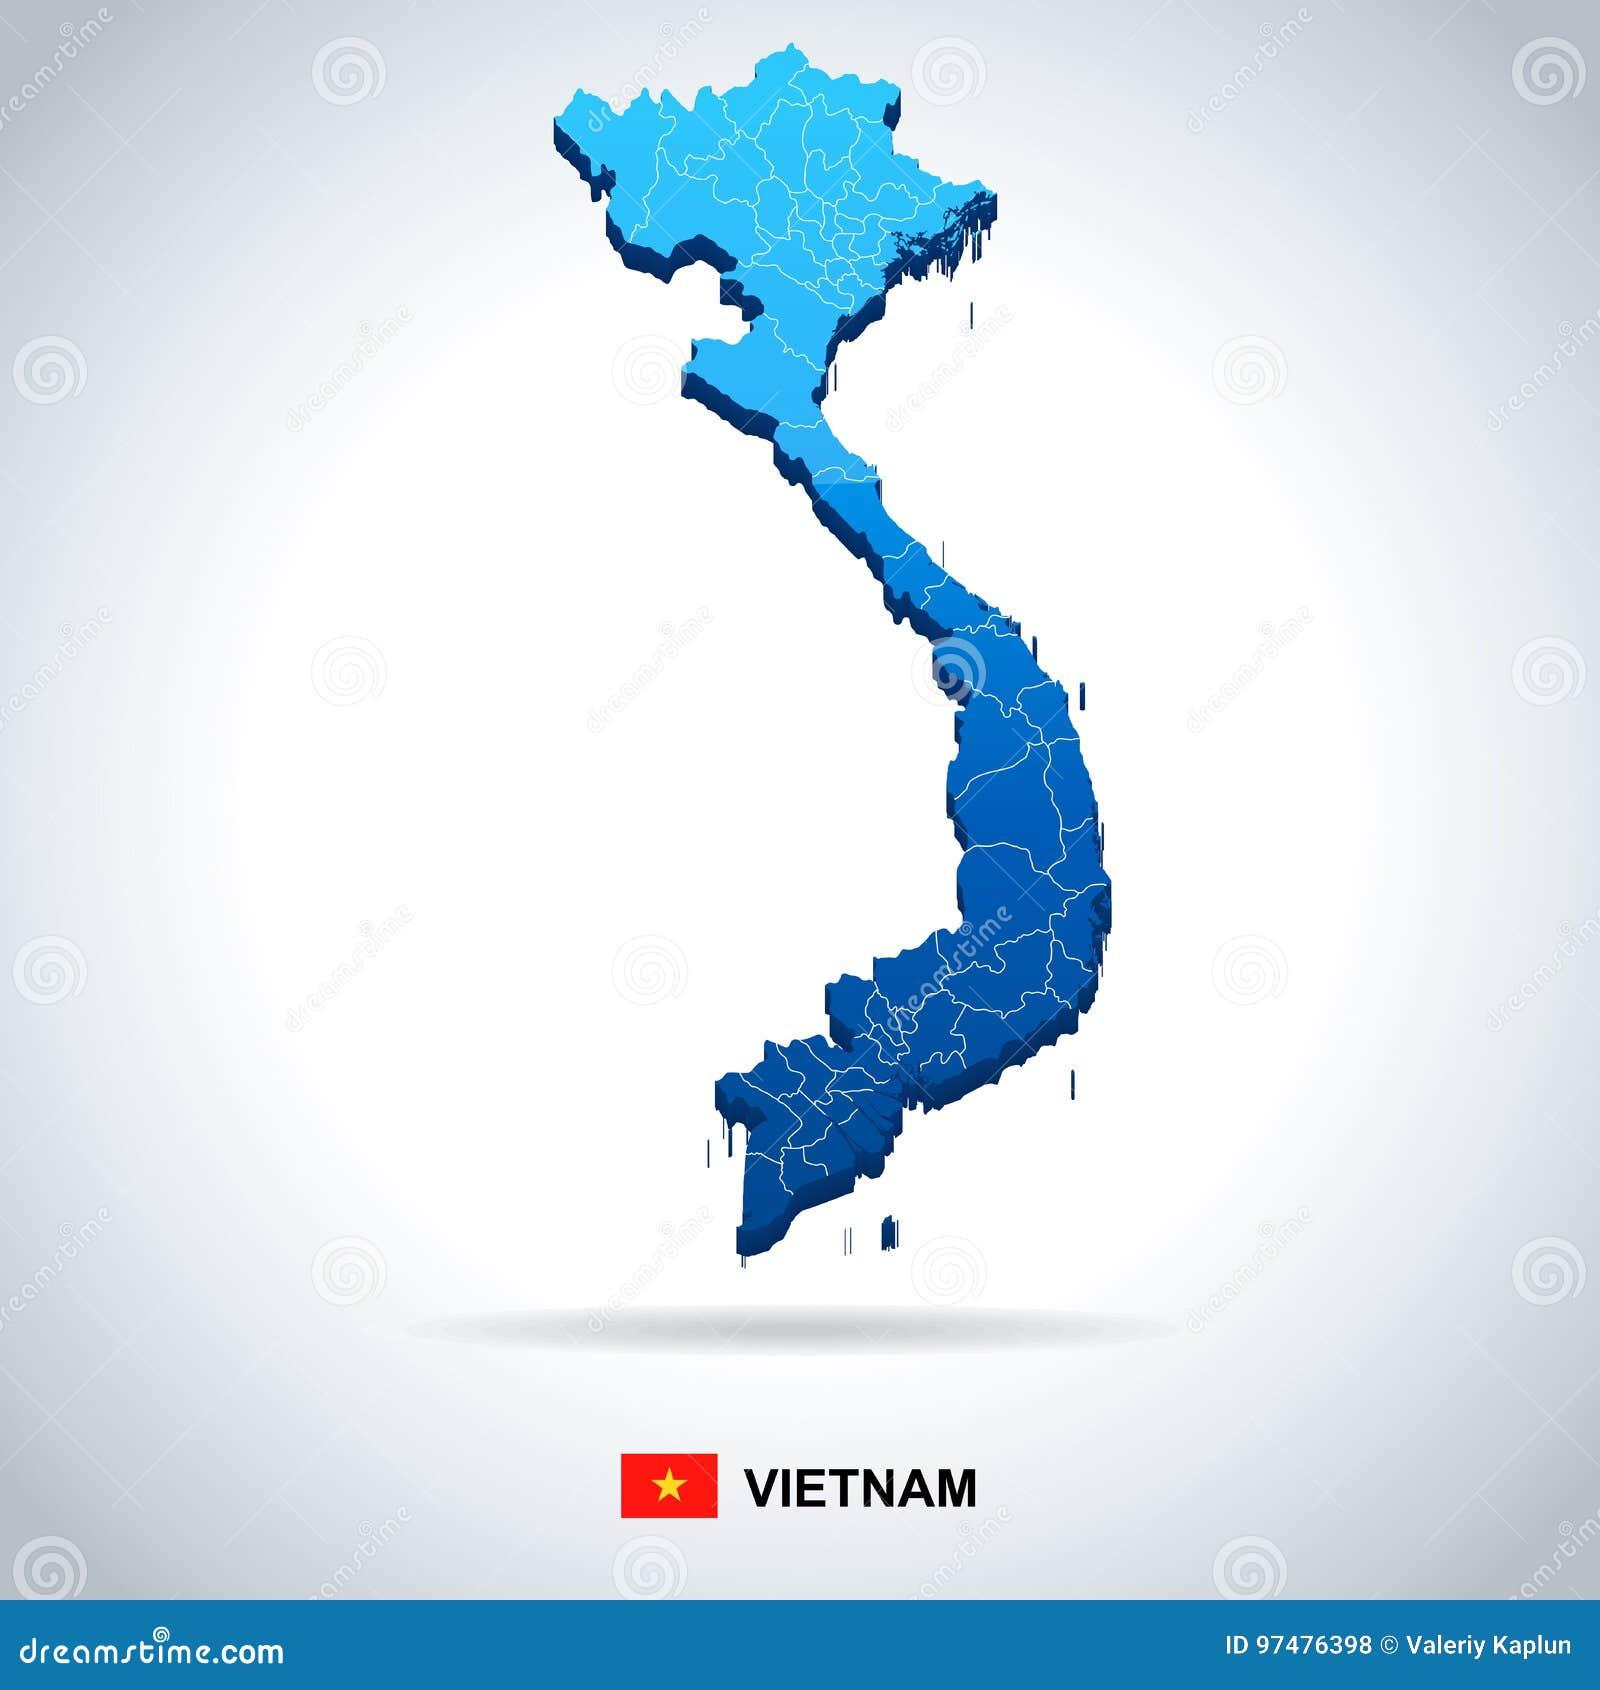 Vietnam Map And Flag Illustration Stock Illustration